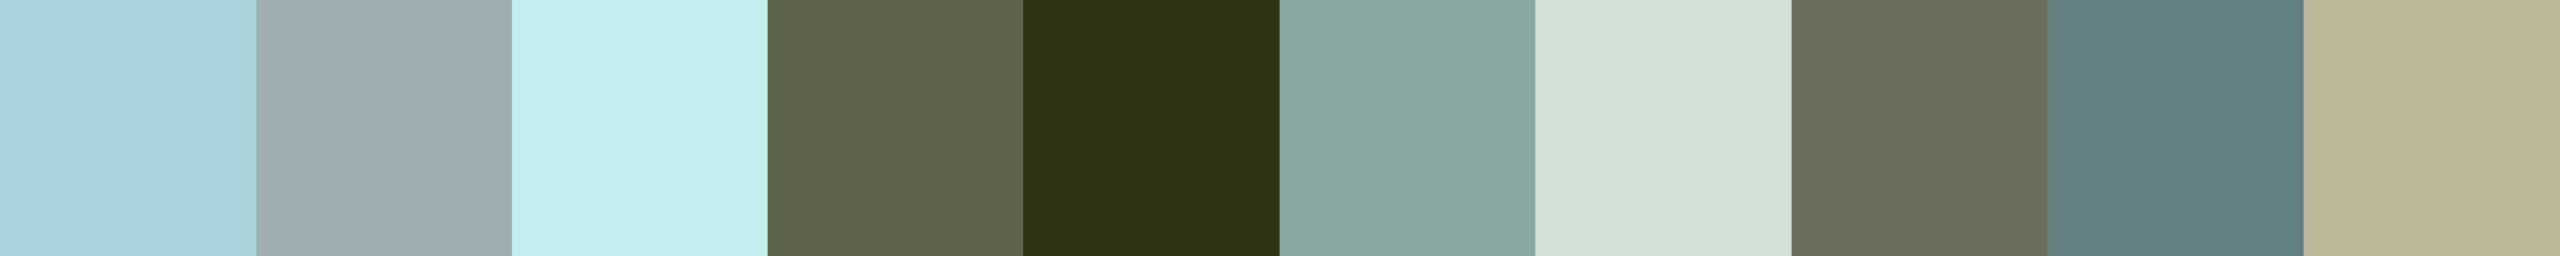 401 Firalka Color Palette